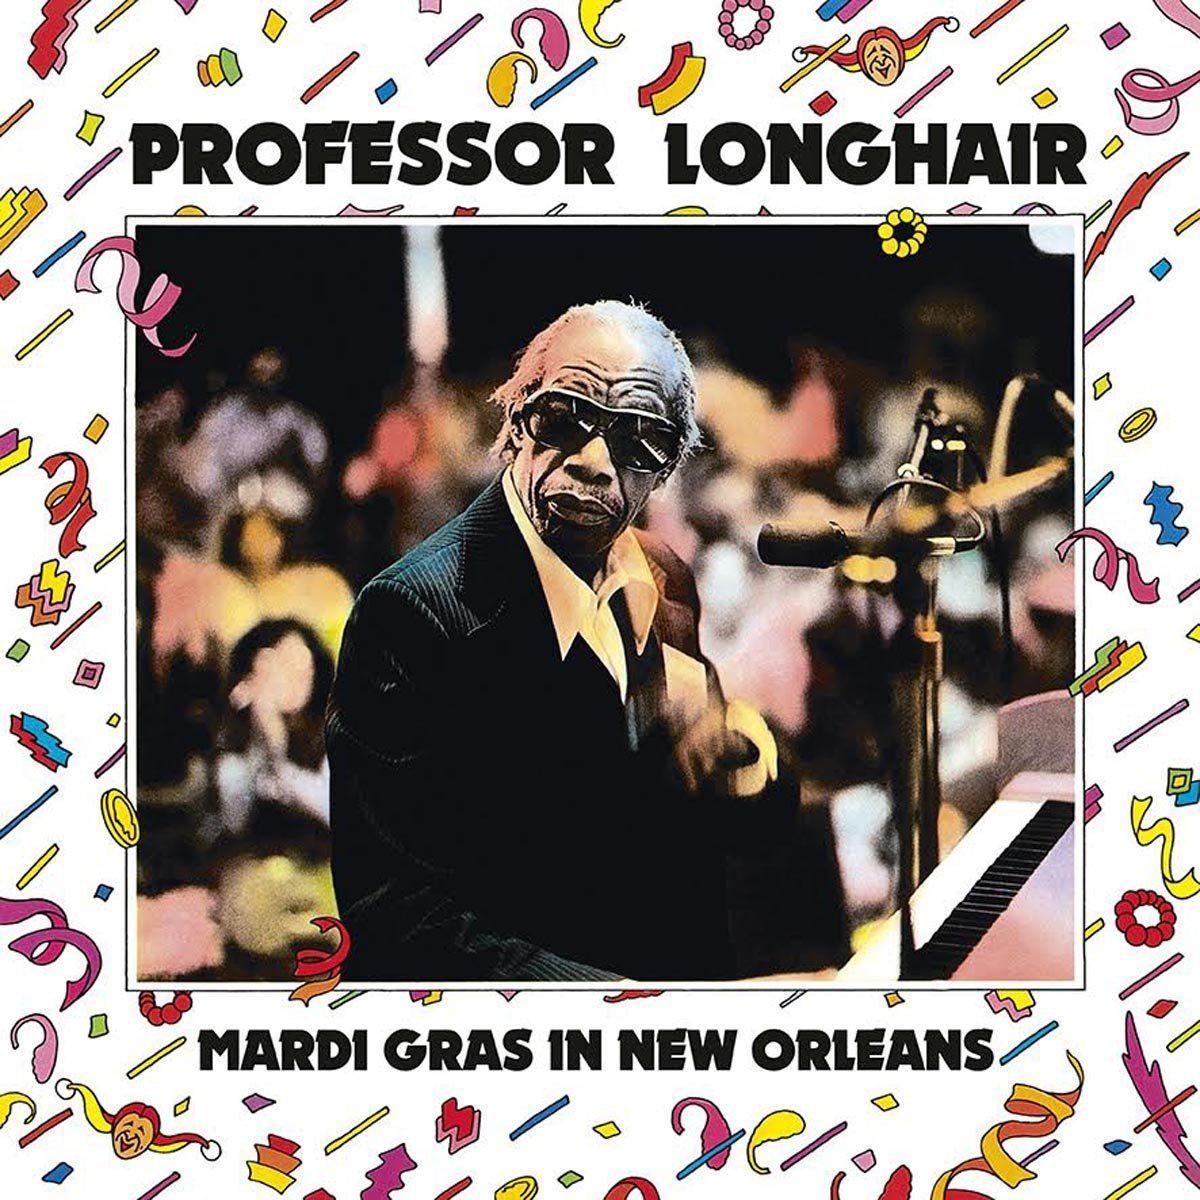 Профессор Лонгхэйр Professor Longhair. Mardi Gras In New Orleans (LP) лонгслив printio mardi gras